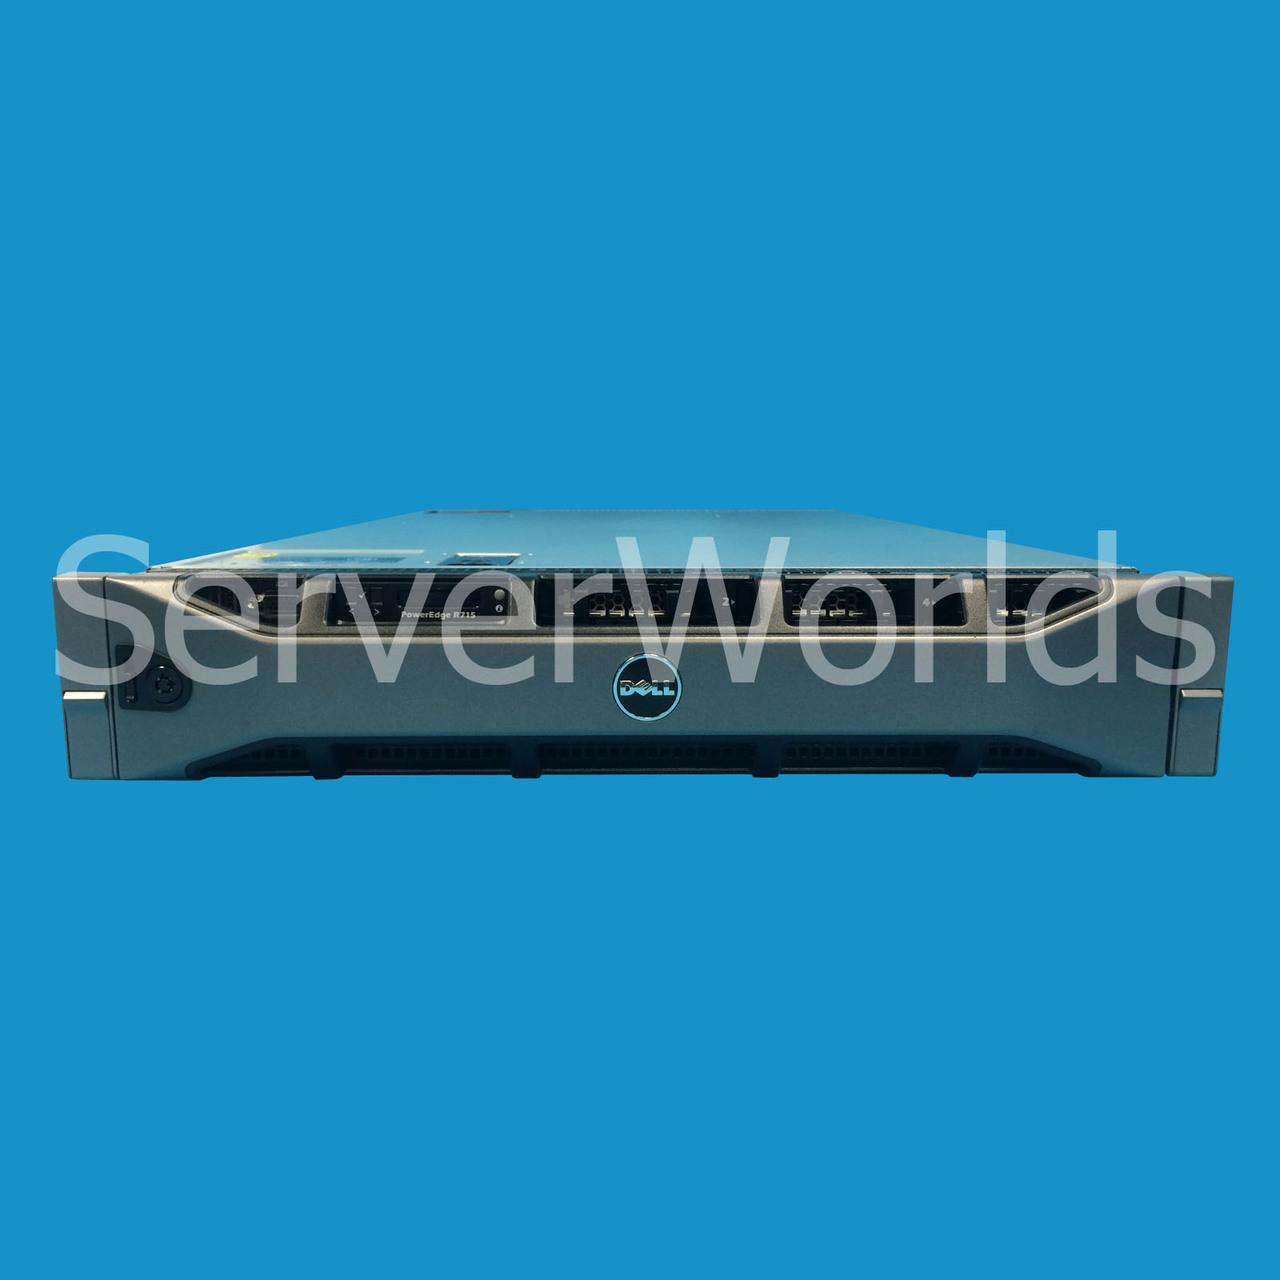 Refurbished Powredge R715 | Used Poweredge R715 | Poweredge